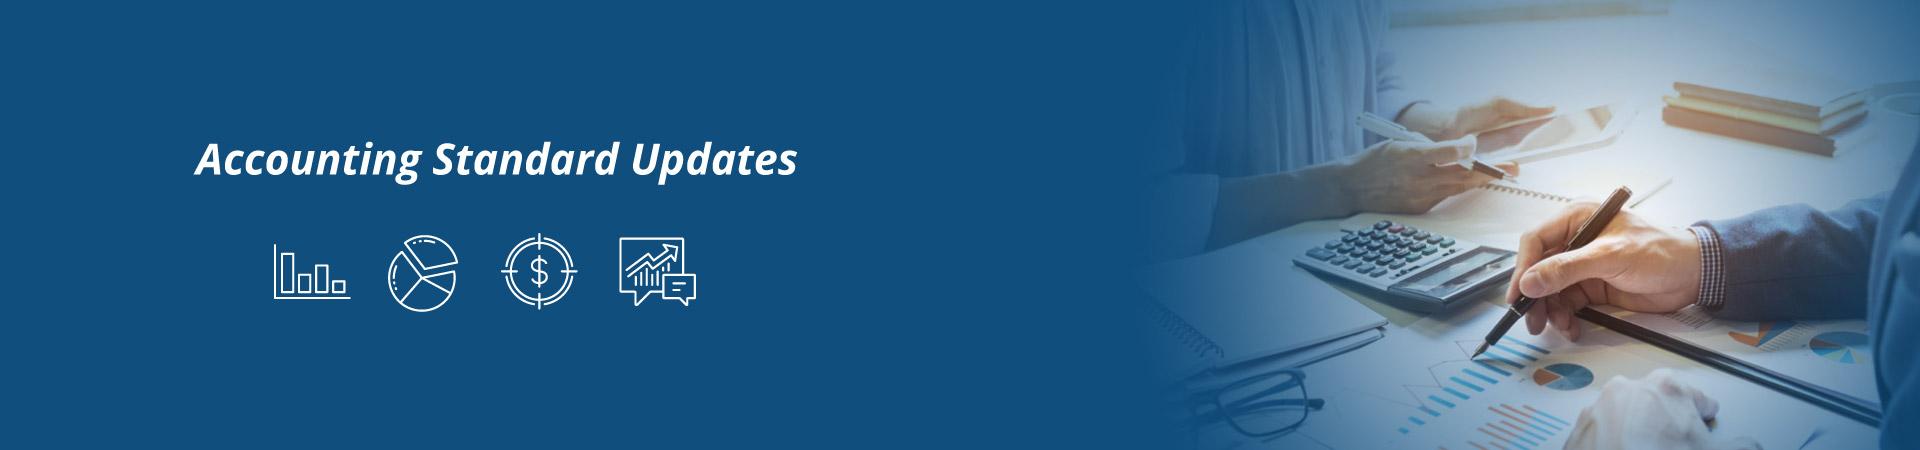 Accounting Standard Updates